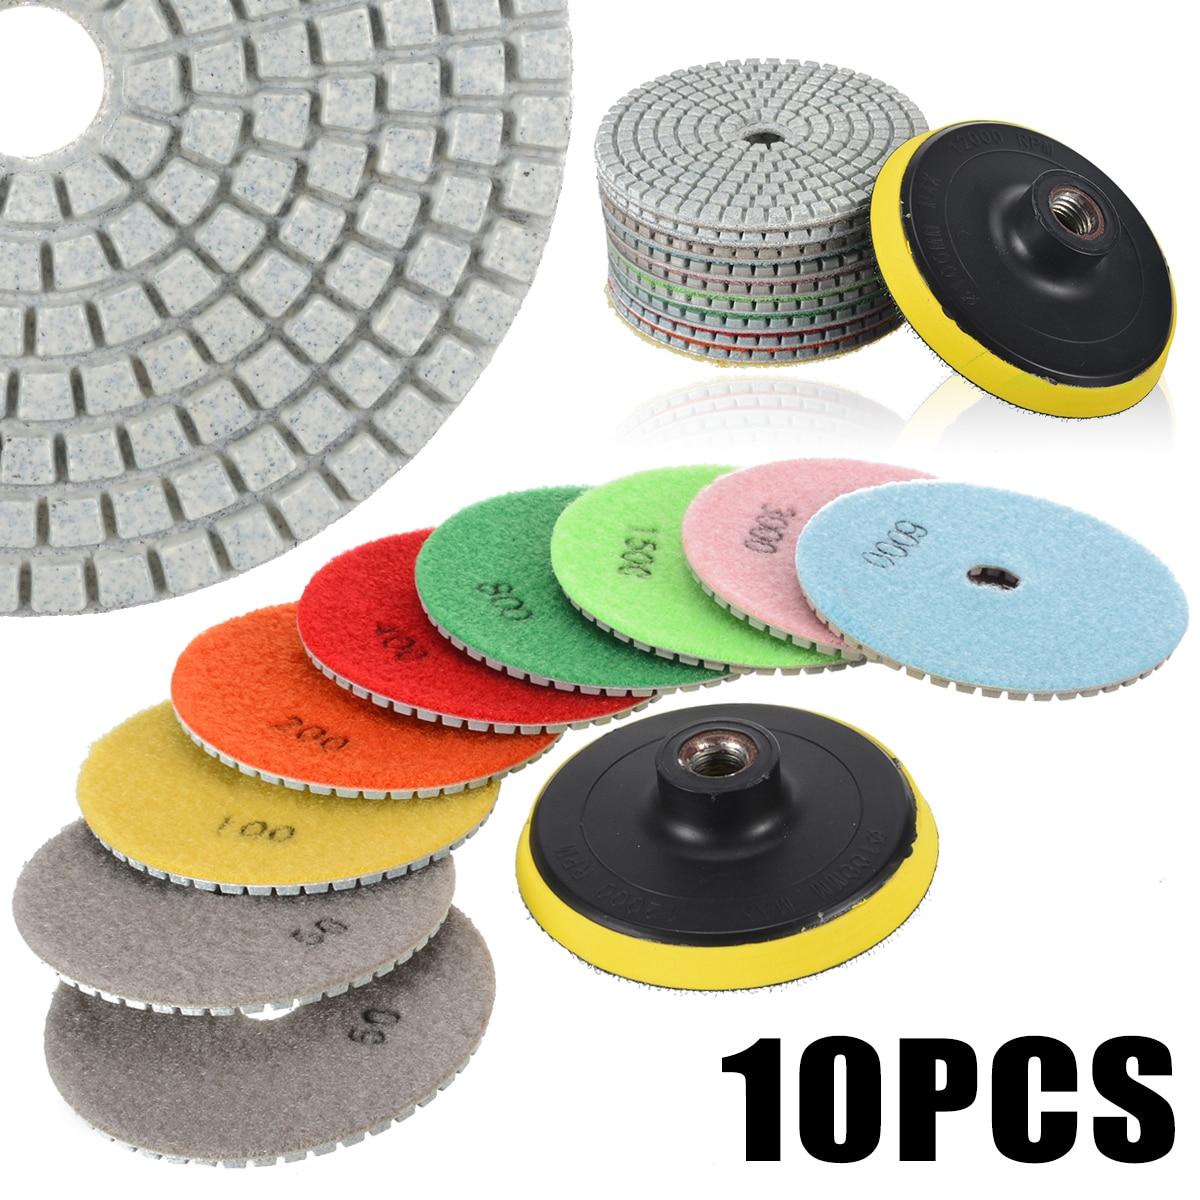 10Pcs Diamond Polishing Pads Kit 4 Inch M14 Polishing Wheel For Granite Stone Concrete Marble Polishing Tool Grinding Discs Set